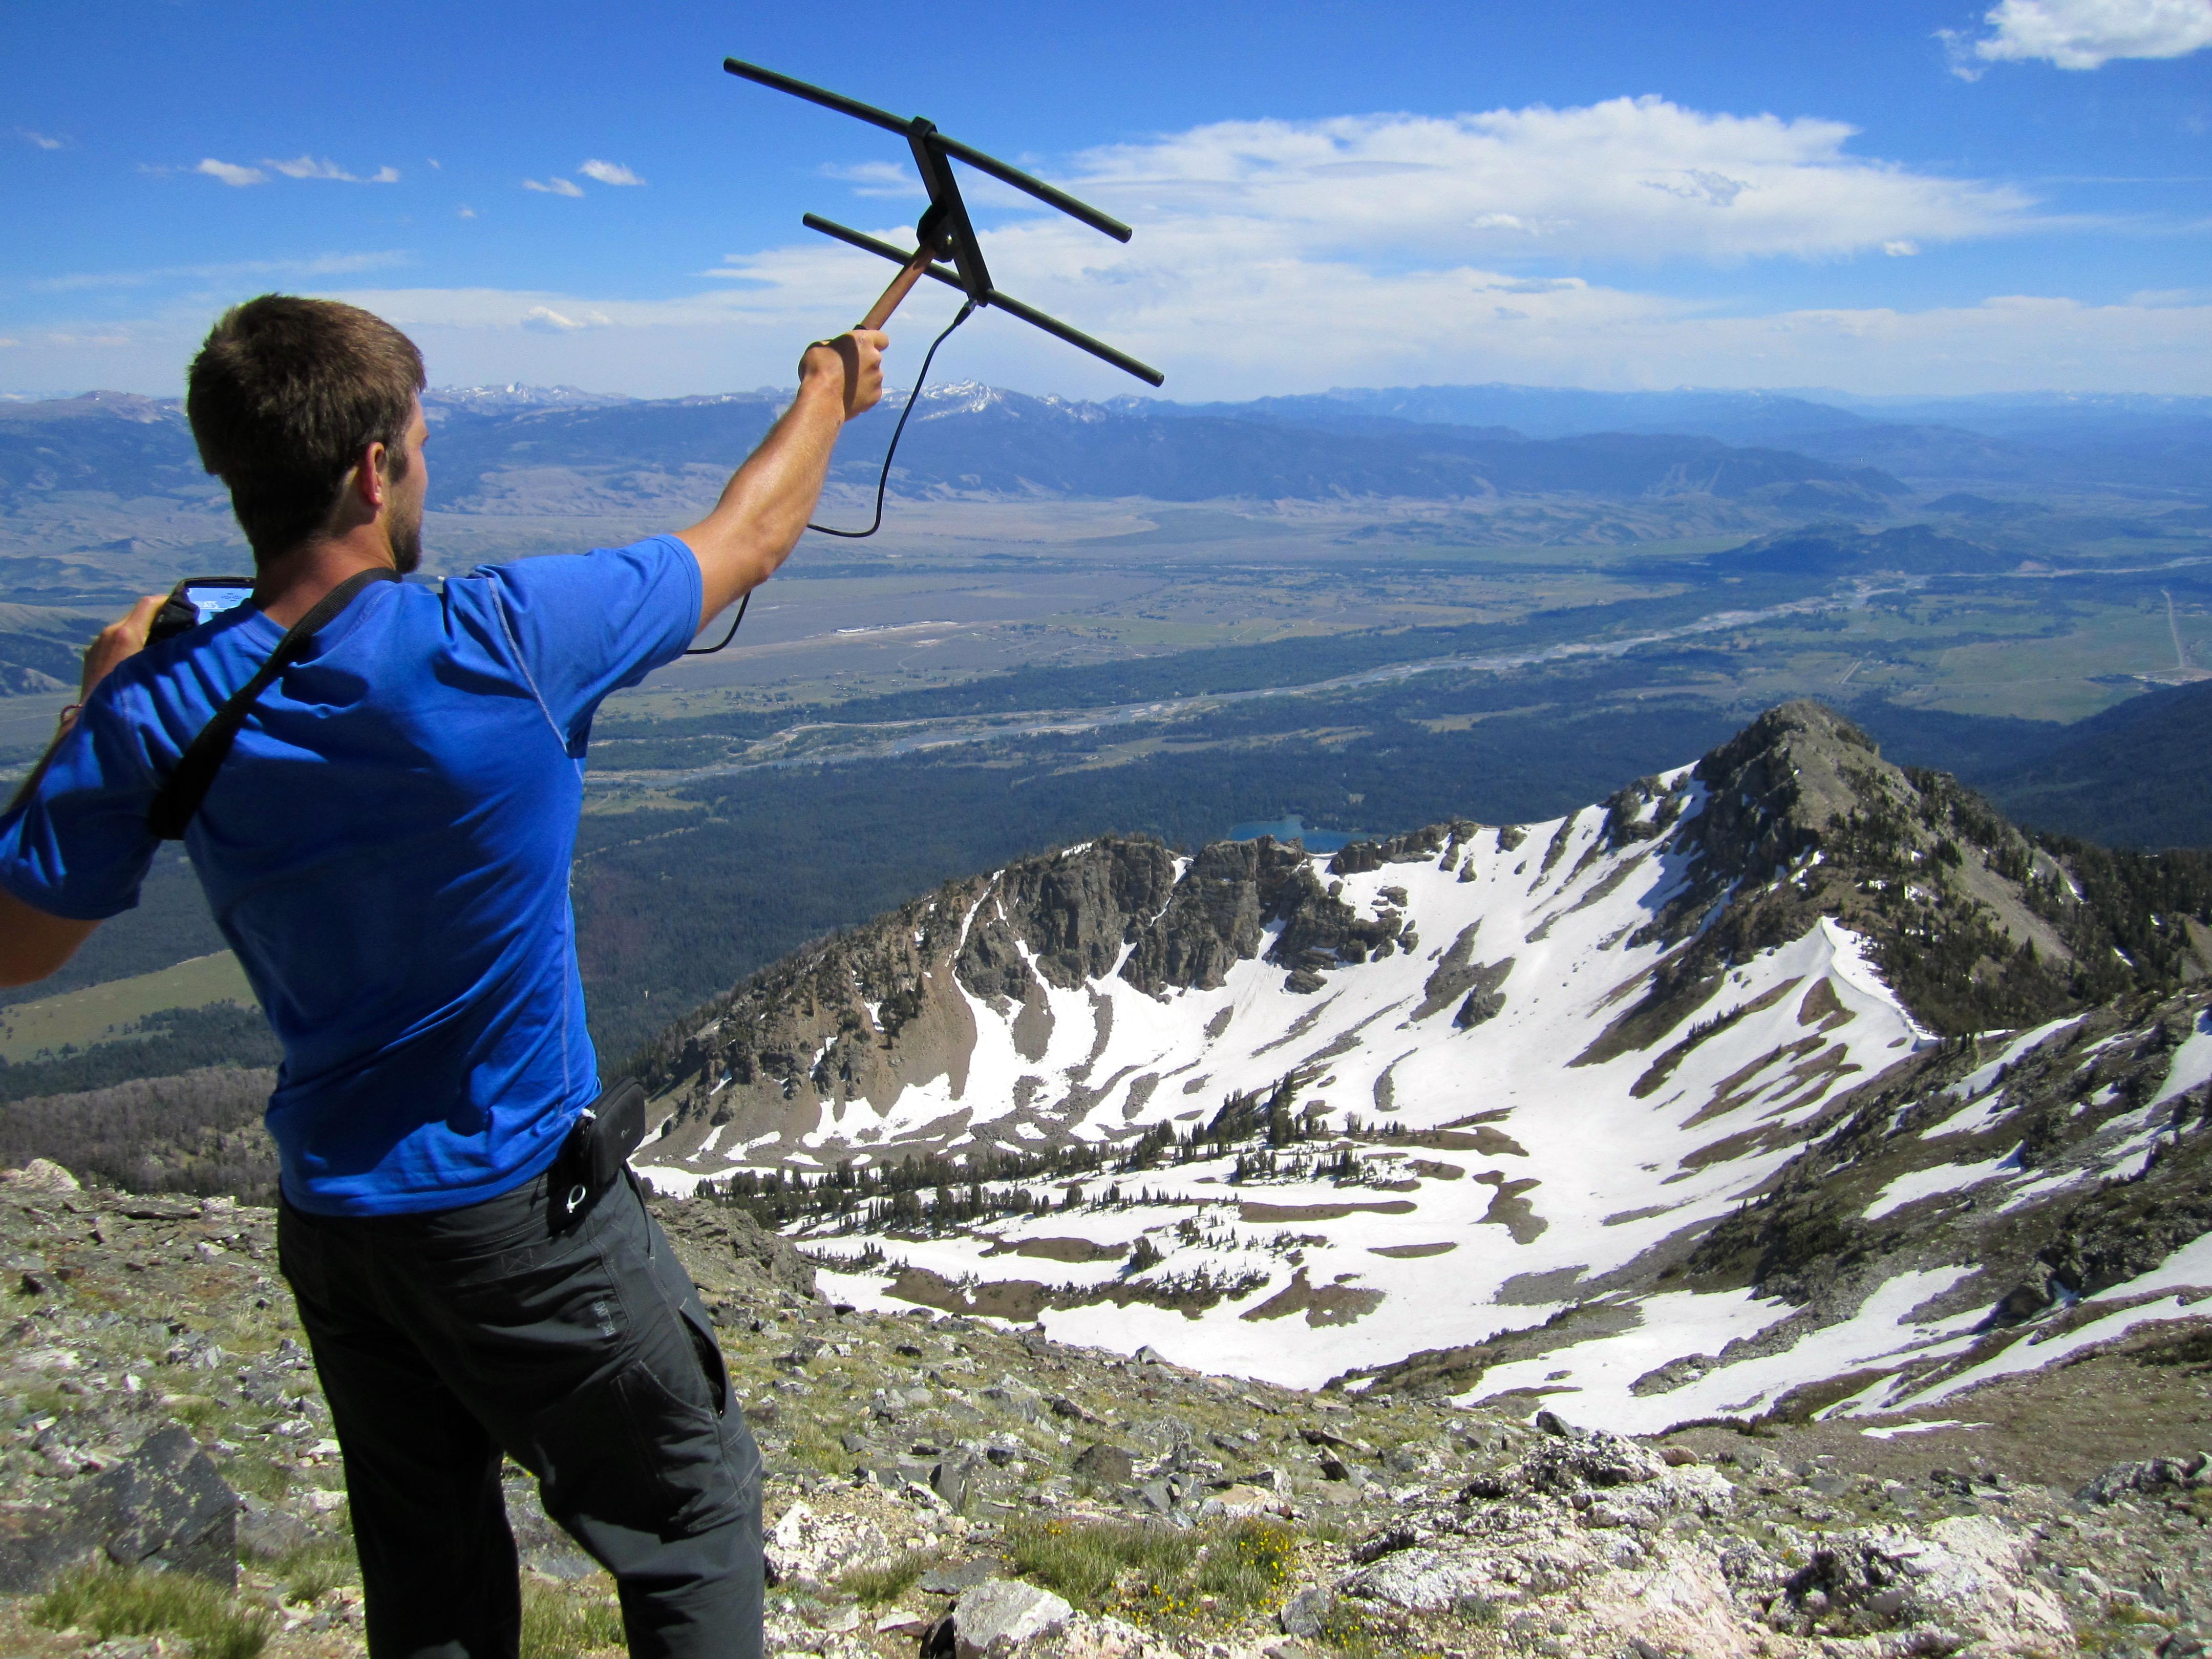 Man holding radio telemetry looking over mountain range